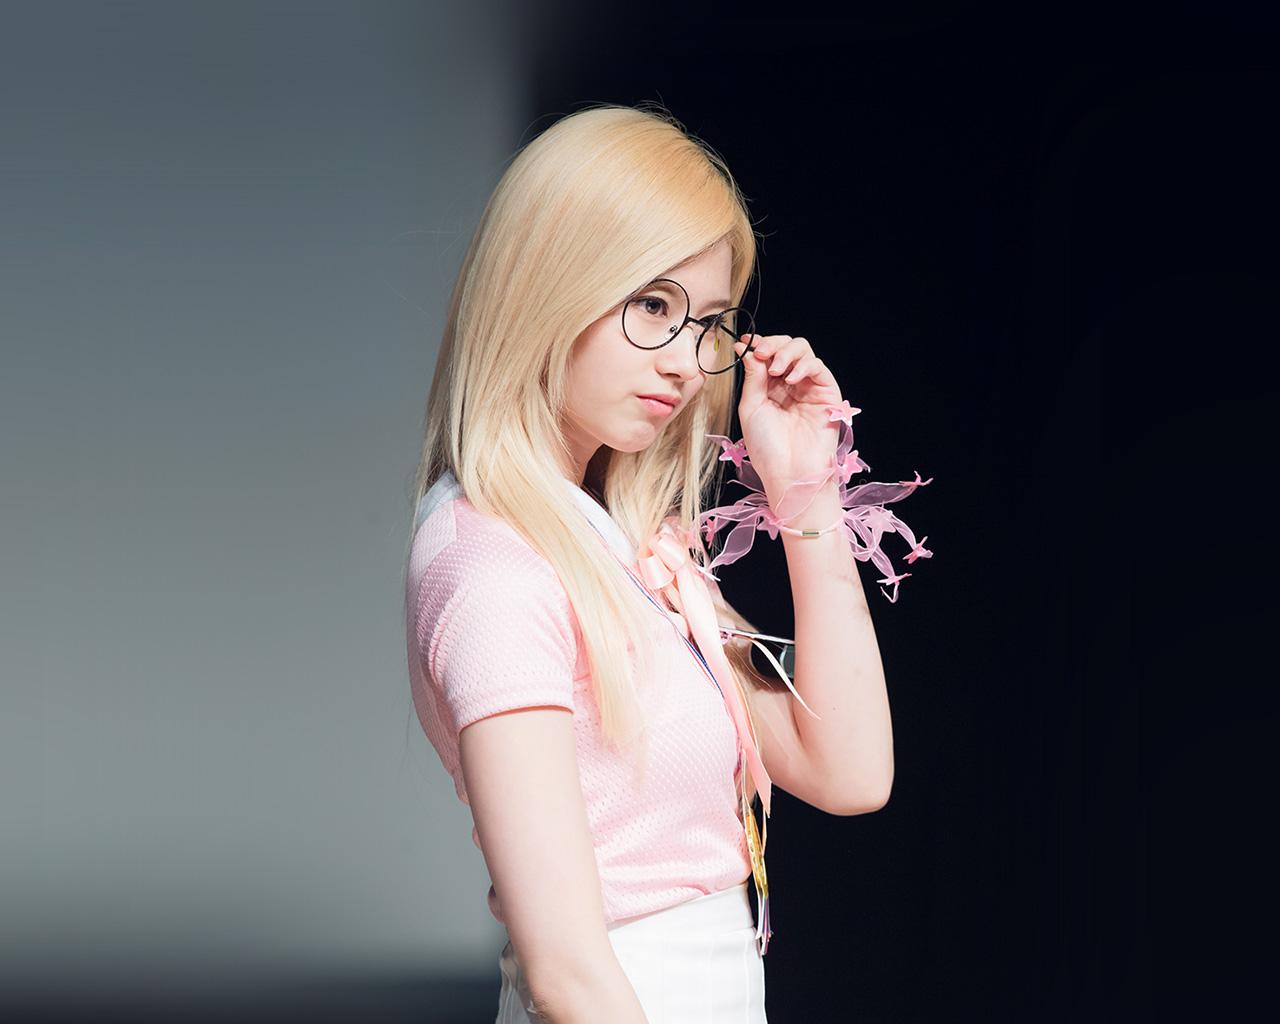 Cute Girl Glasses Wallpaper Hl05 Sana Kpop Girl Cute Wallpaper